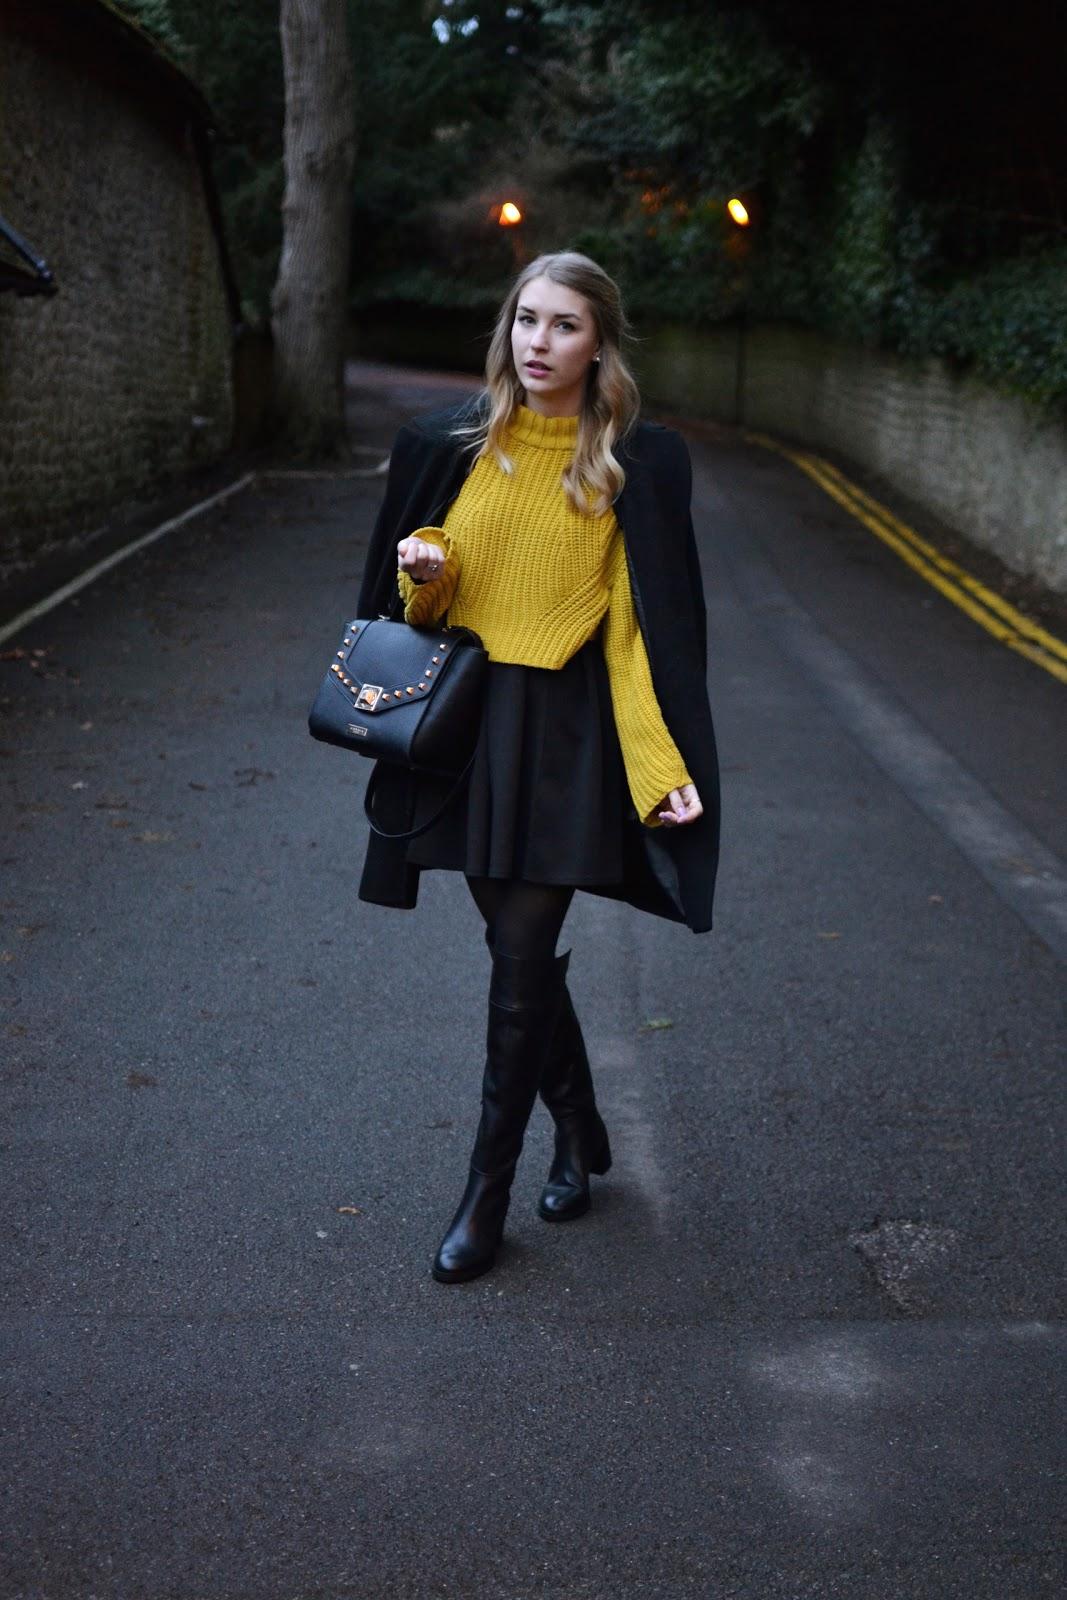 Luxembourg fashion blogger Kristiana Vasarina